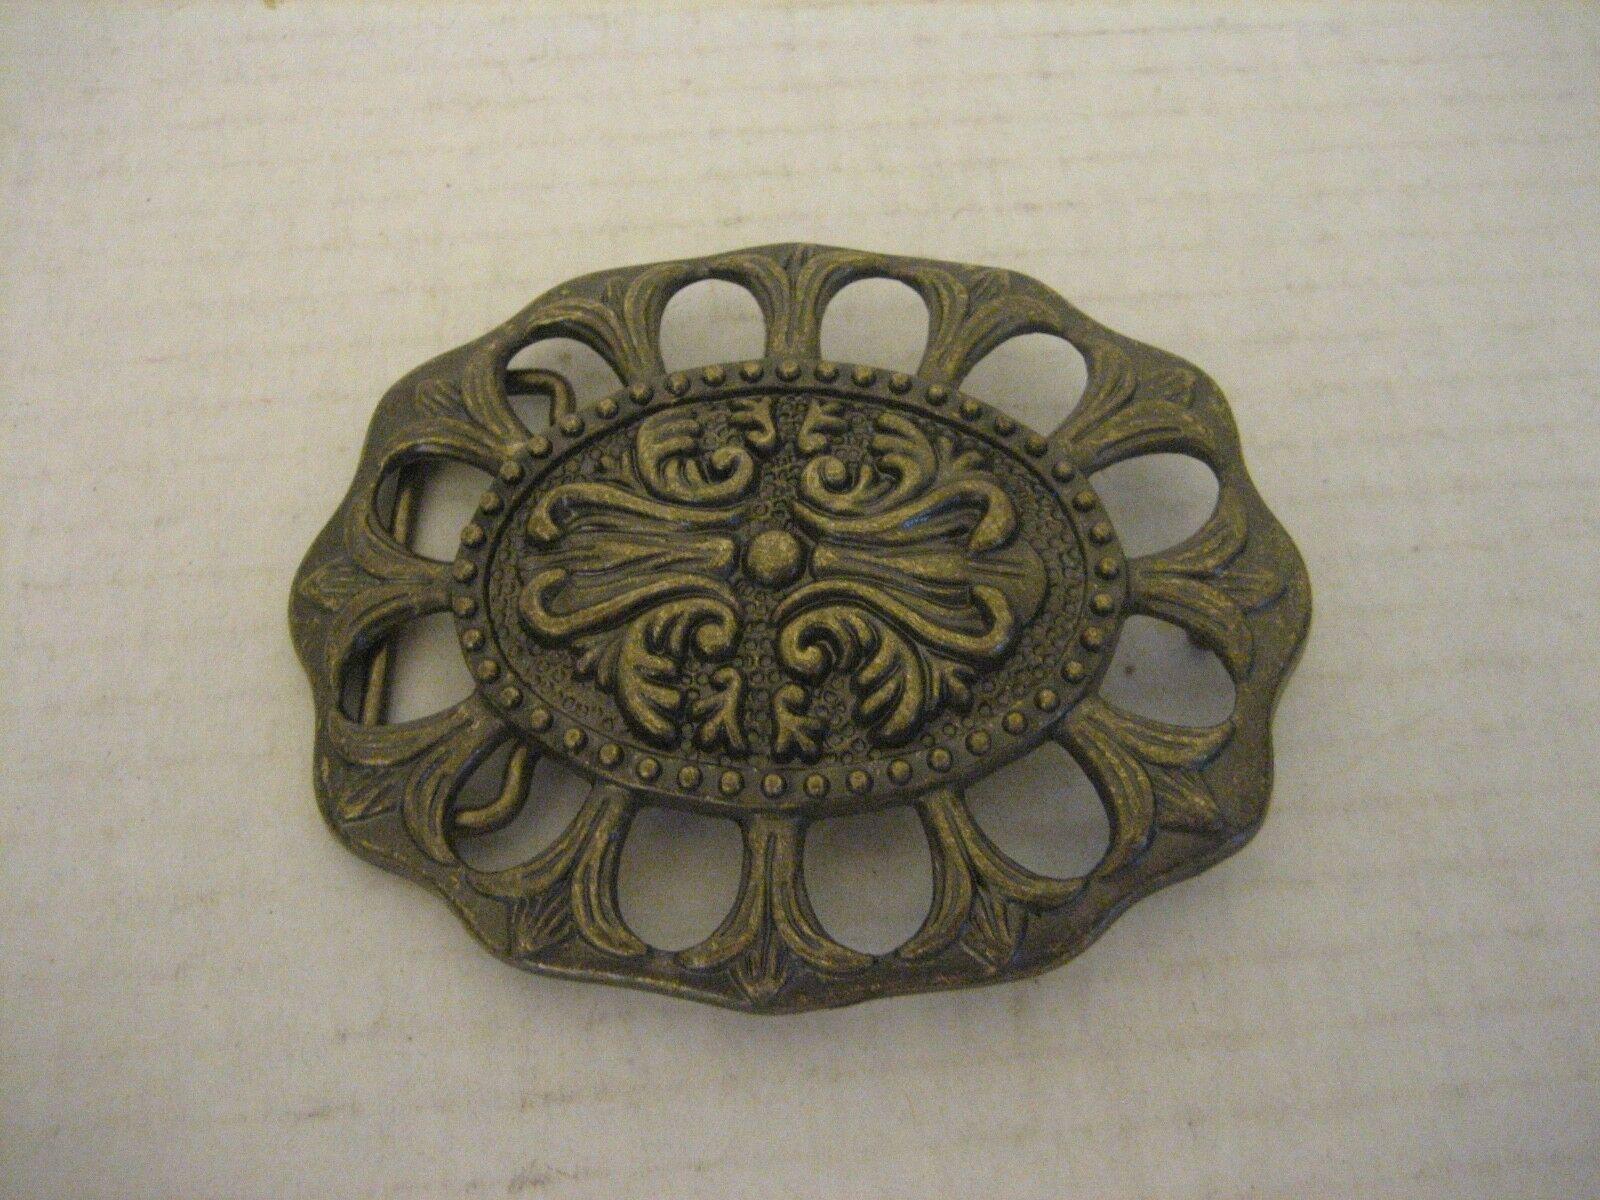 Women's Metal Oval Decorative Belt Buckle 4in.L. x 3in.W. Buckle Only NWNT